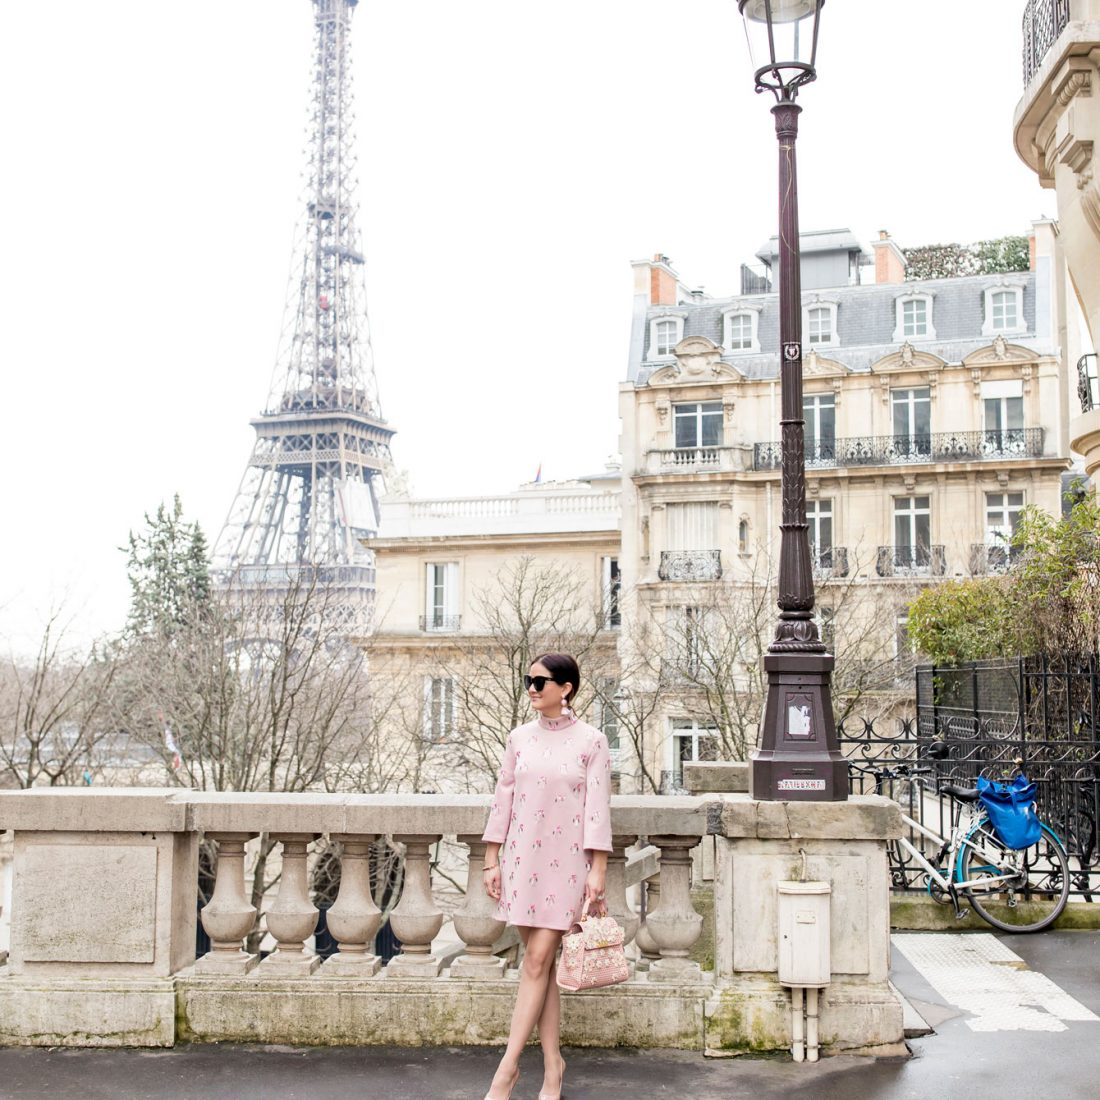 Jennifer Lake Paris Best Eiffel Tower View